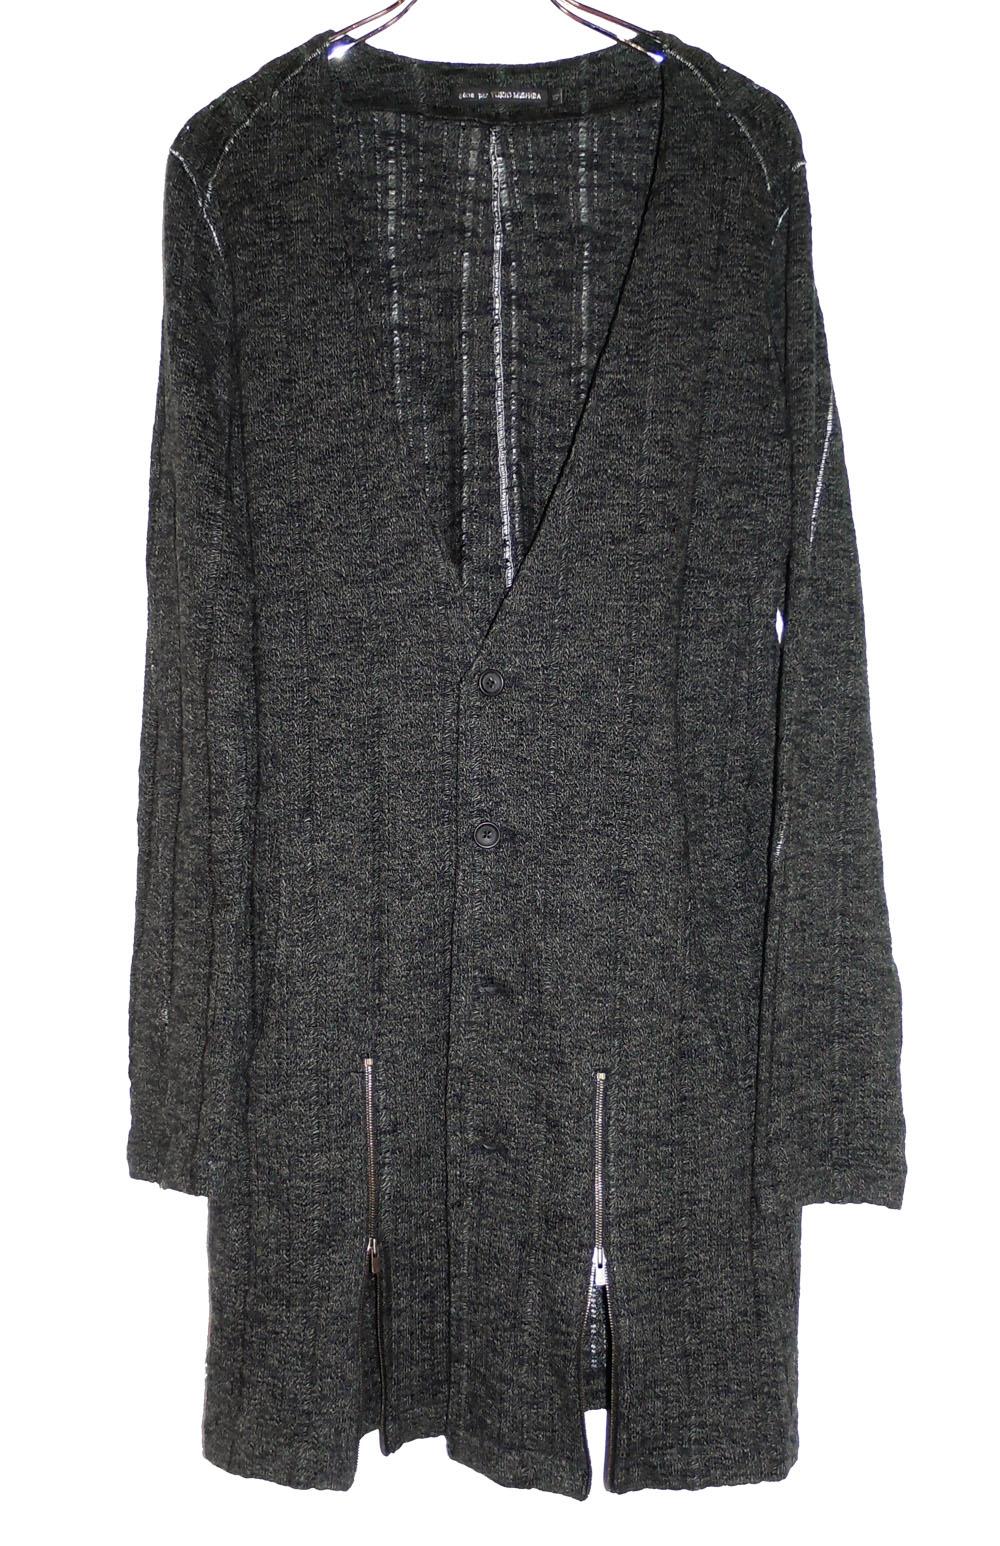 Cotton ,Linen Cut&Sew